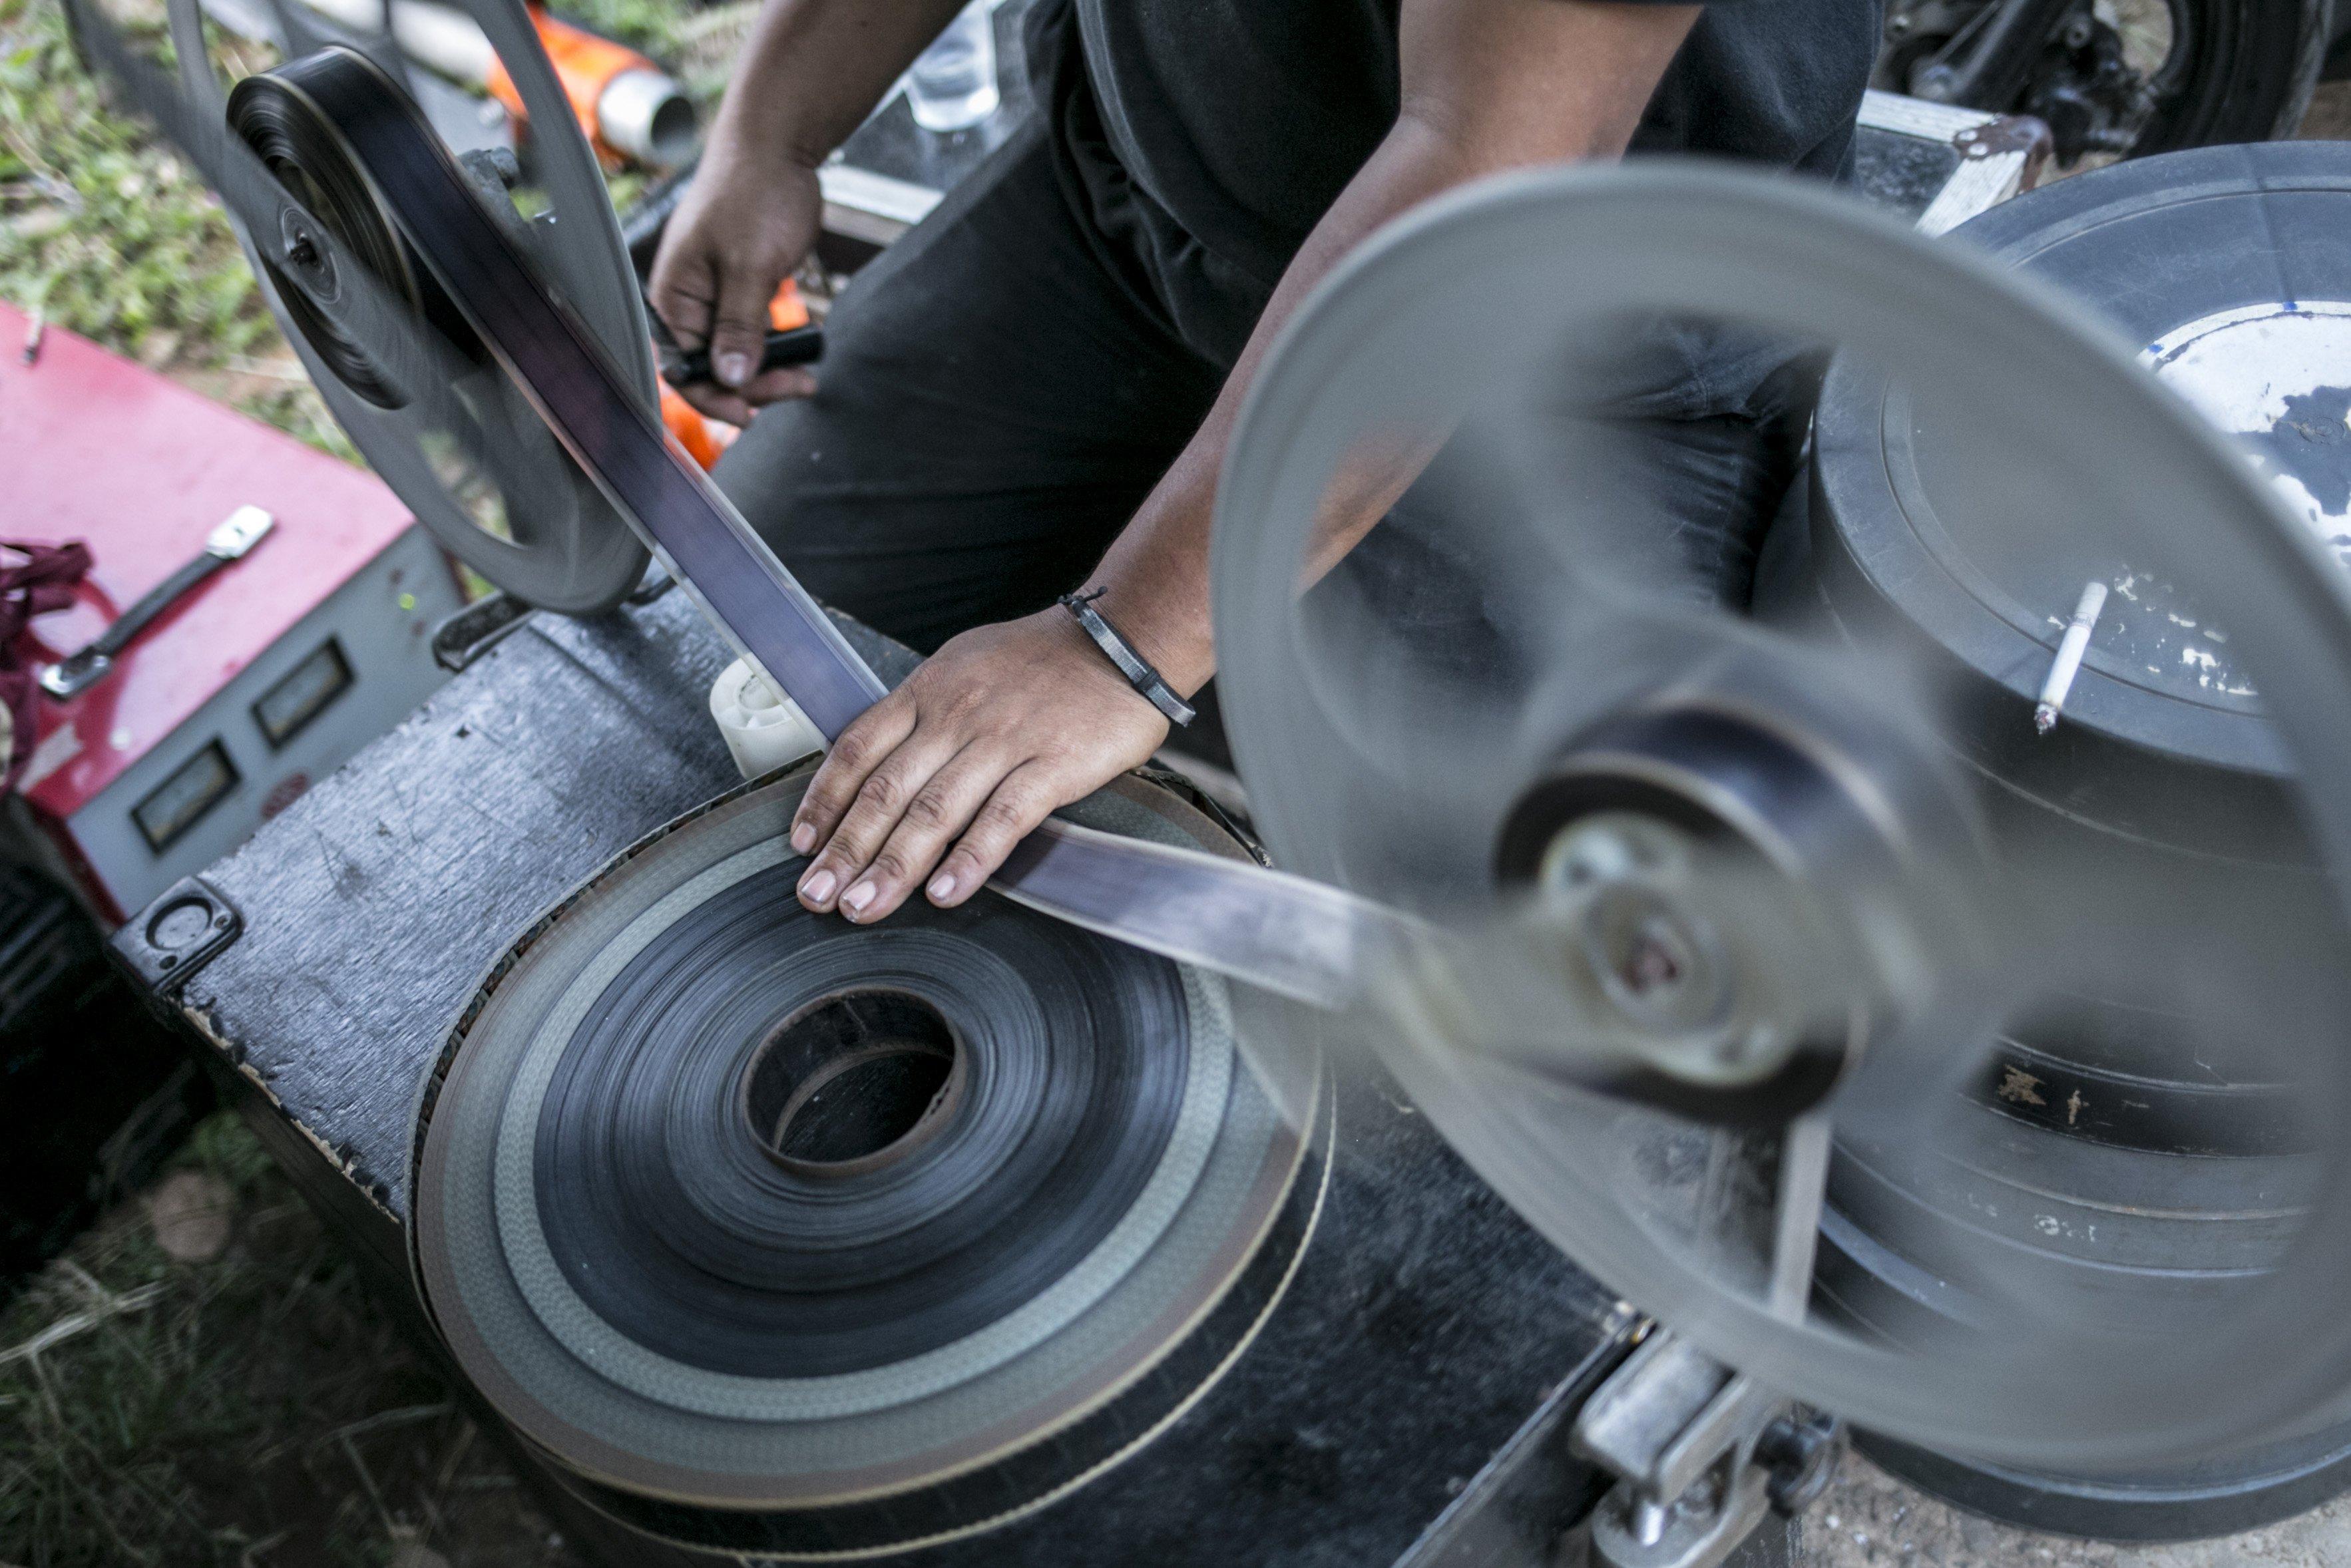 Teknisi mempersiapkan film 35mm untuk pemutaran layar tancap di Kawasan Sawangan, Depok, Jawa Barat, Sabtu (11/7/2020).